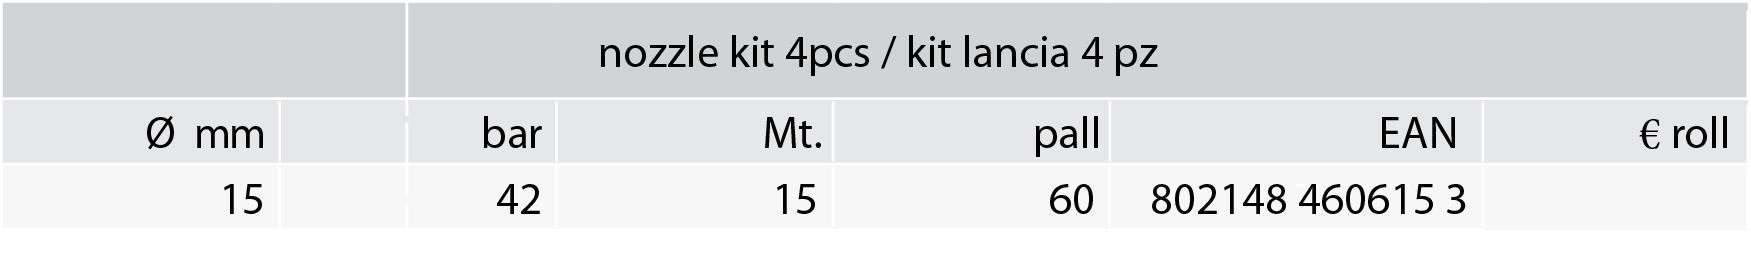 tabella kit